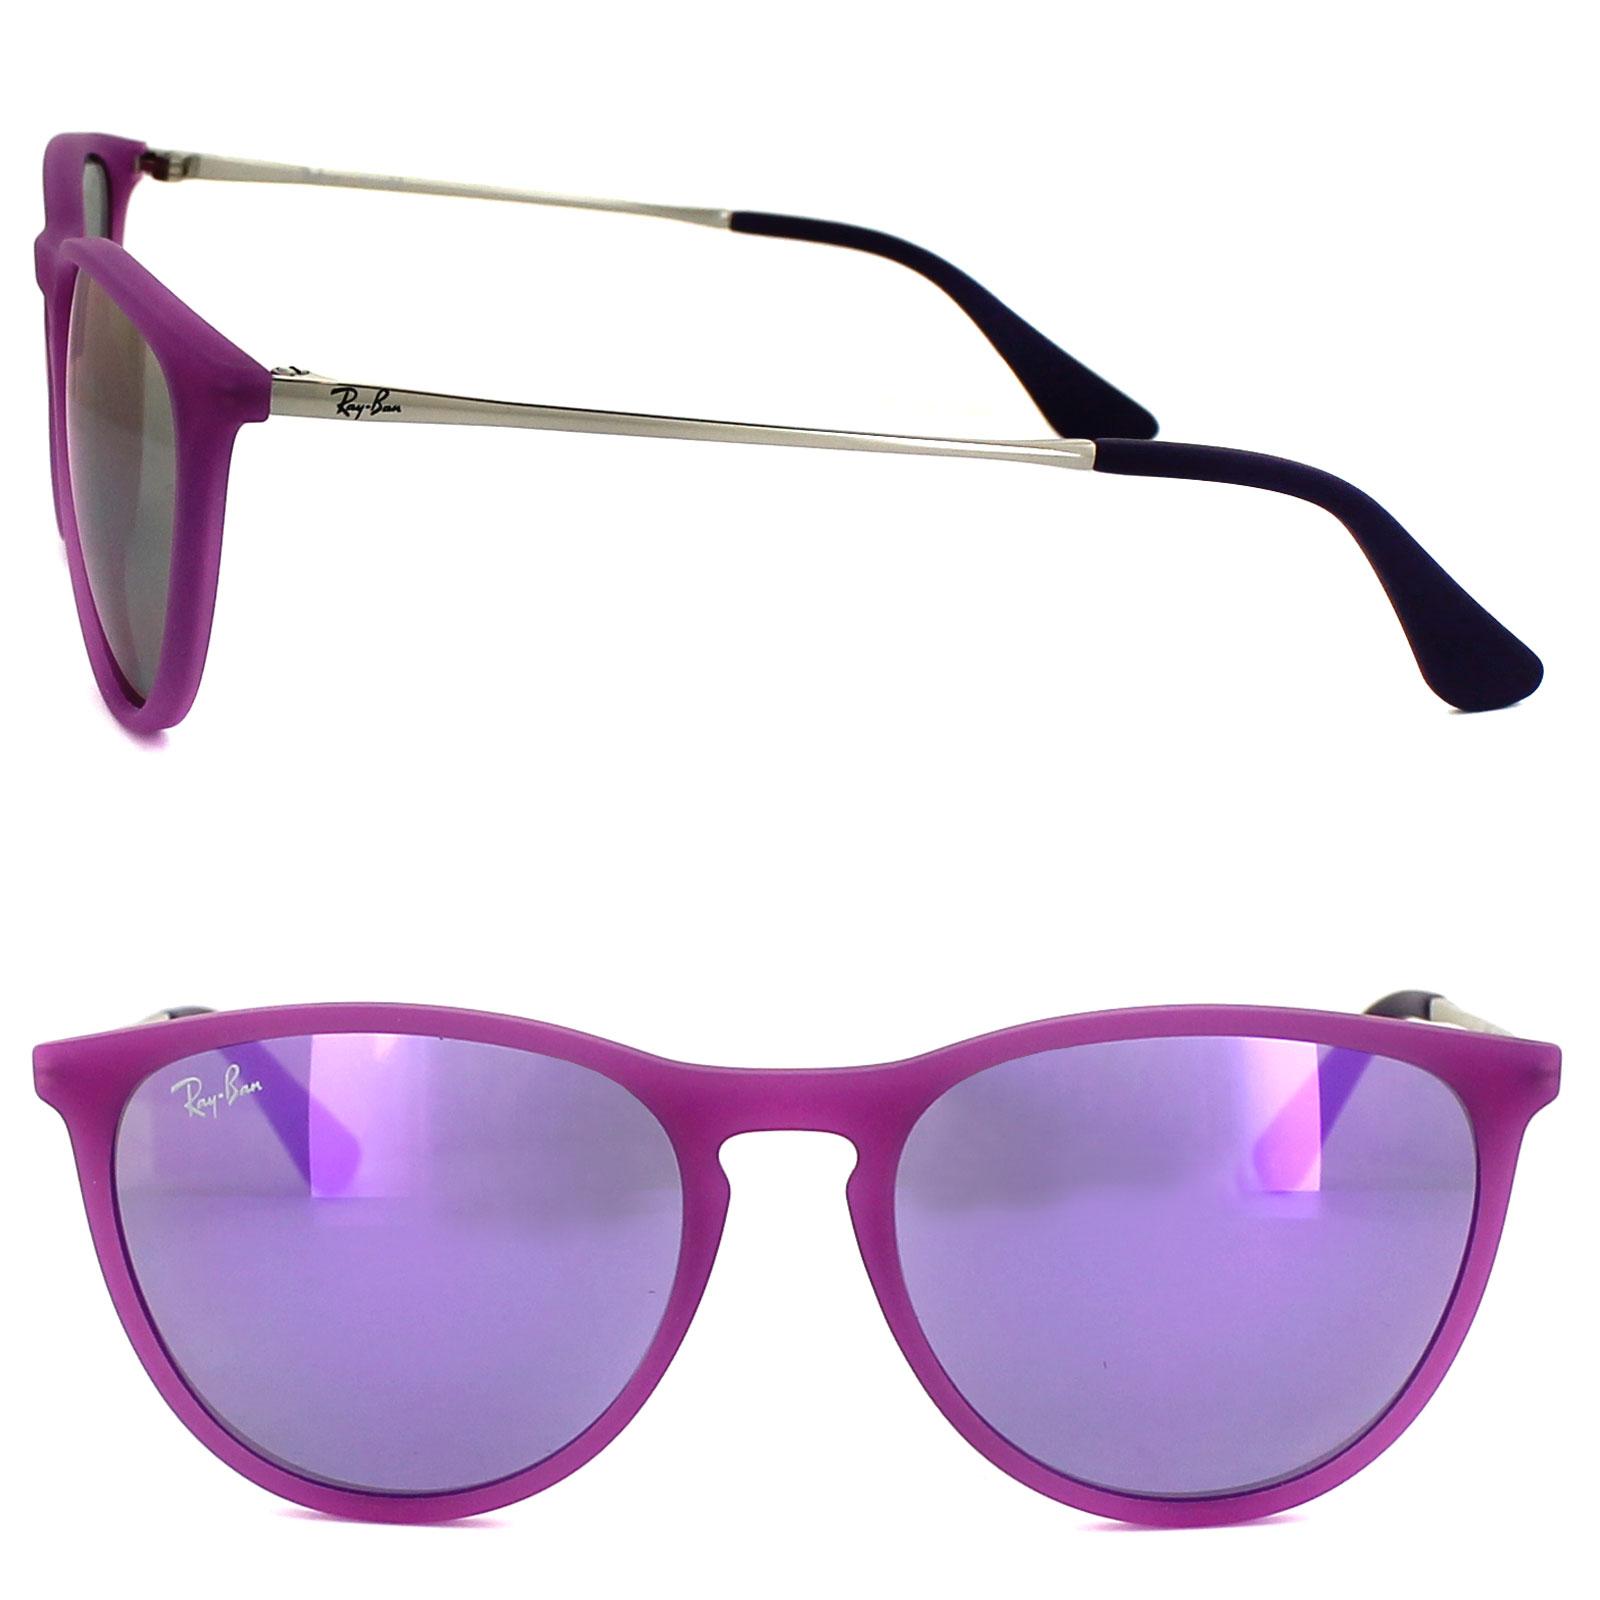 55815c69eca Sentinel Ray-Ban Junior Sunglasses Izzy 9060 70084V Rubber Violet Violet  Mirror